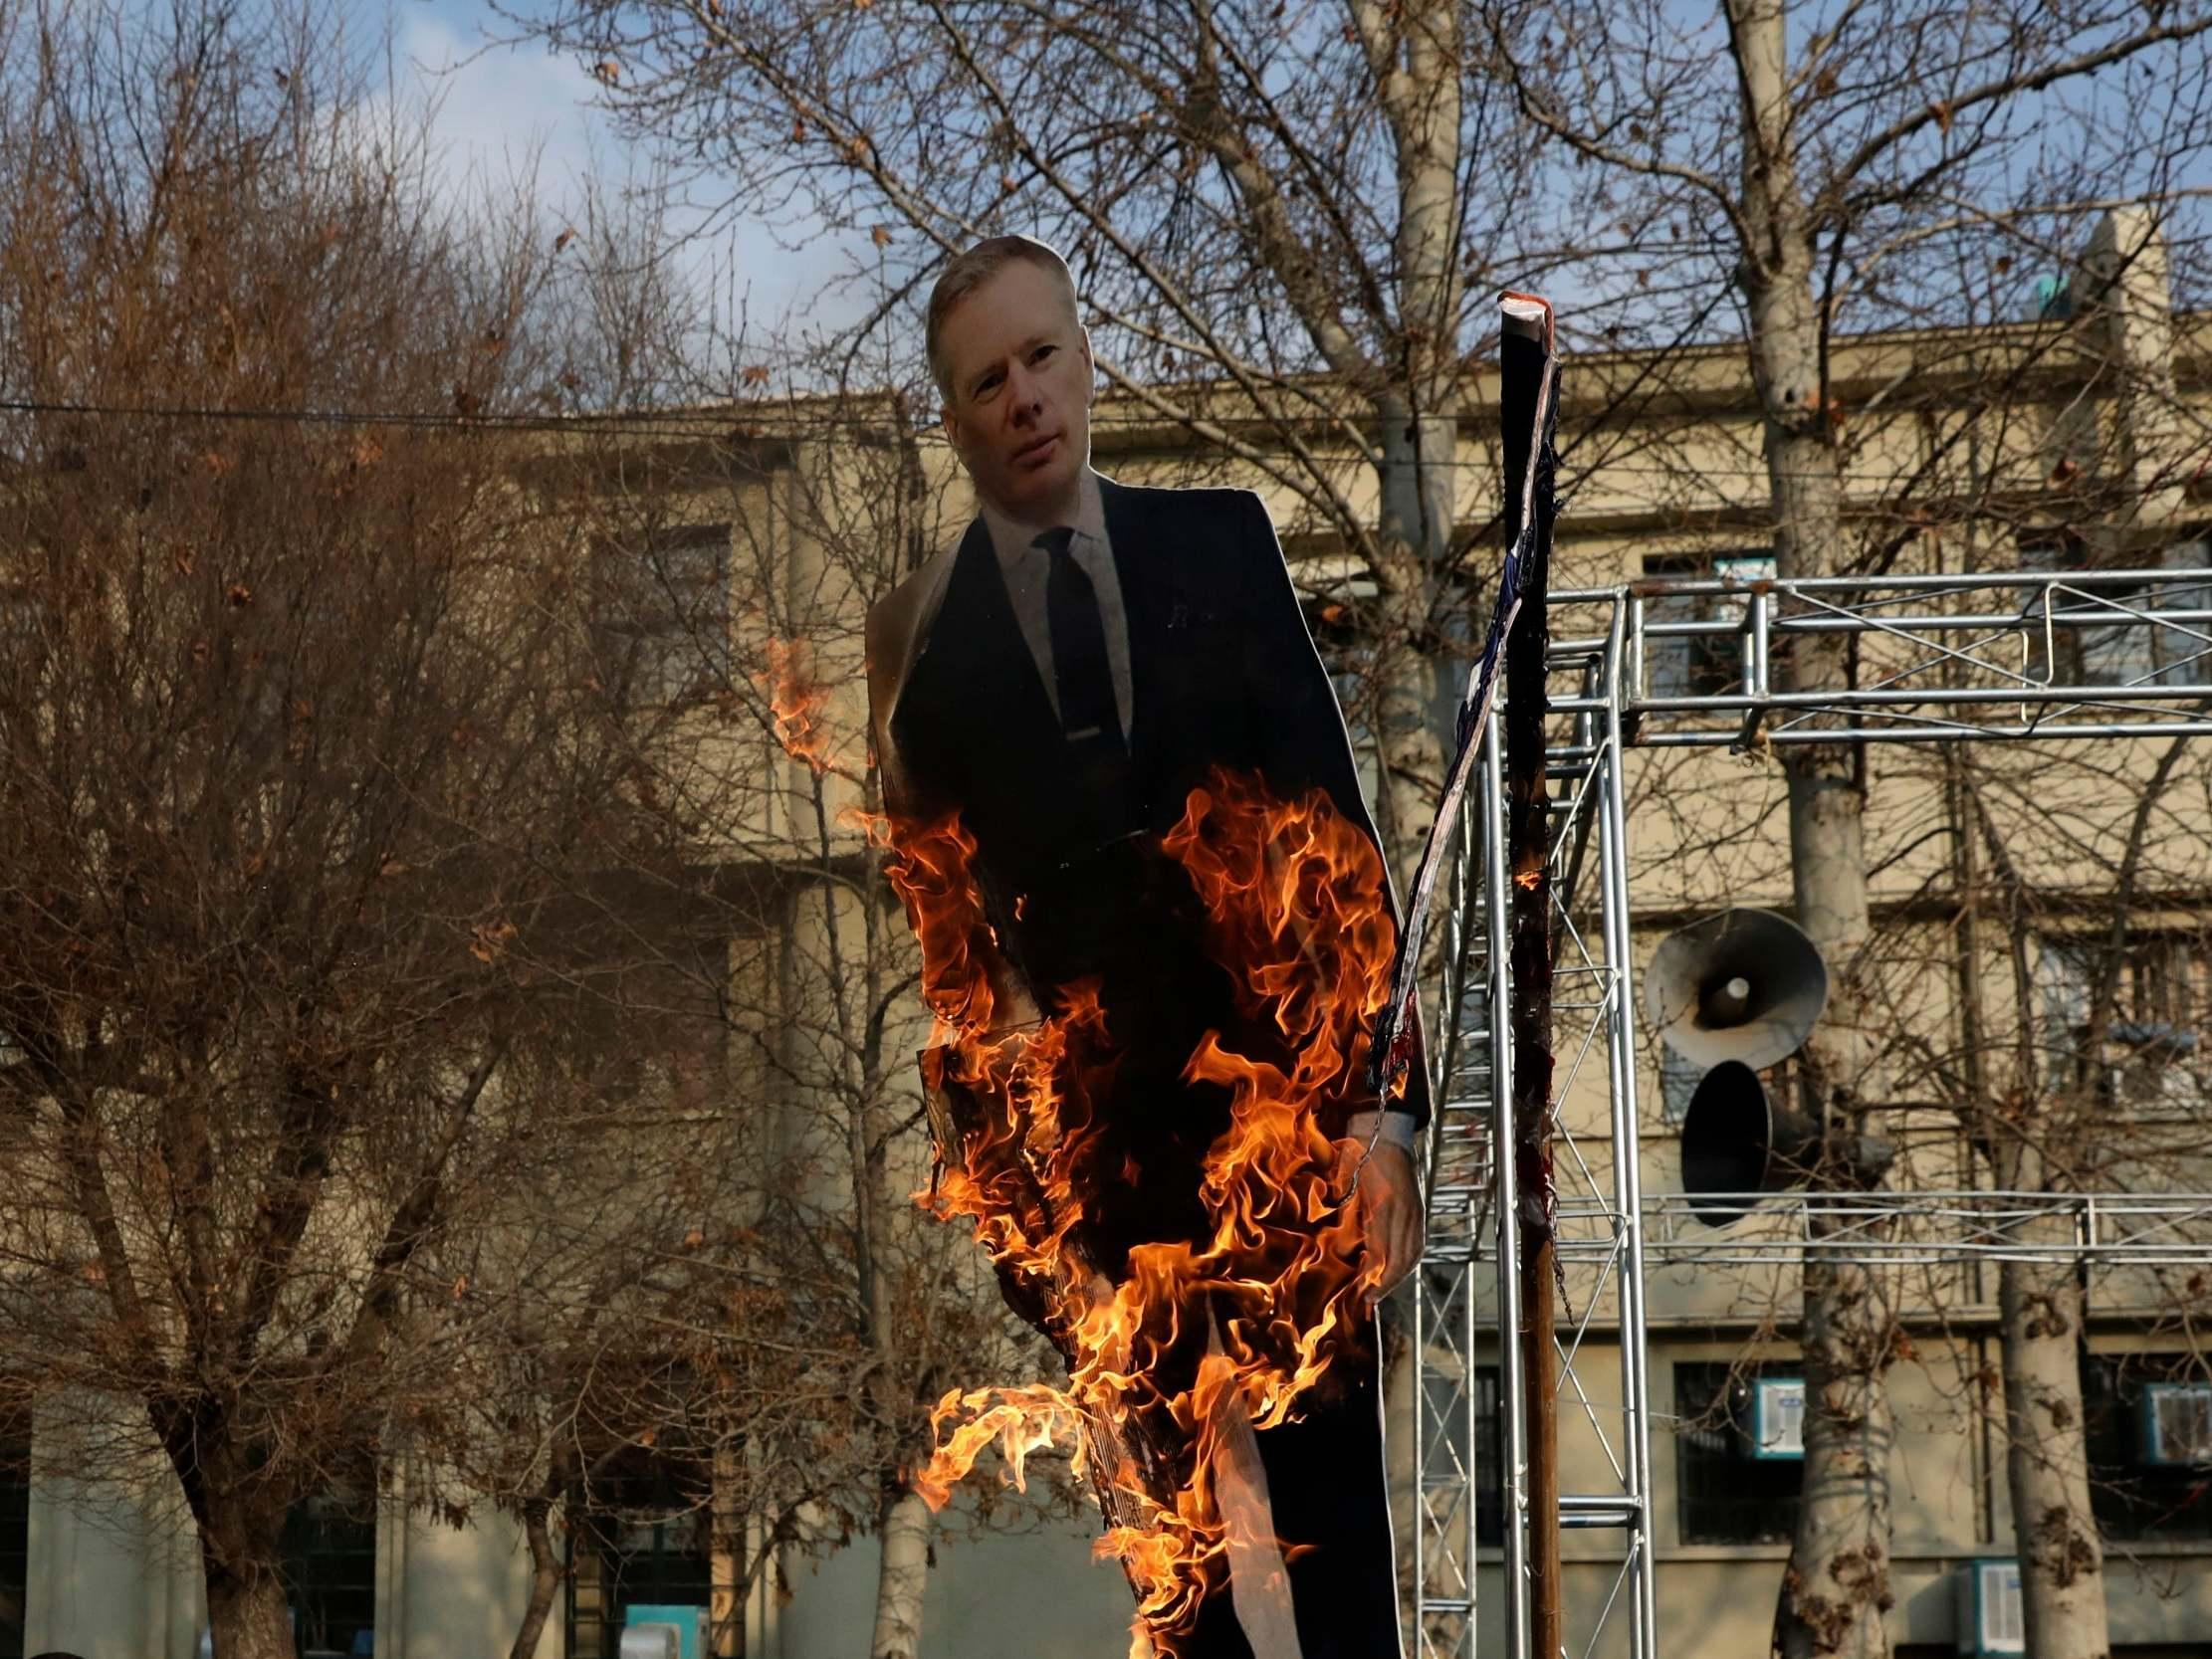 Iran crisis: Effigy of UK ambassador burned in Tehran